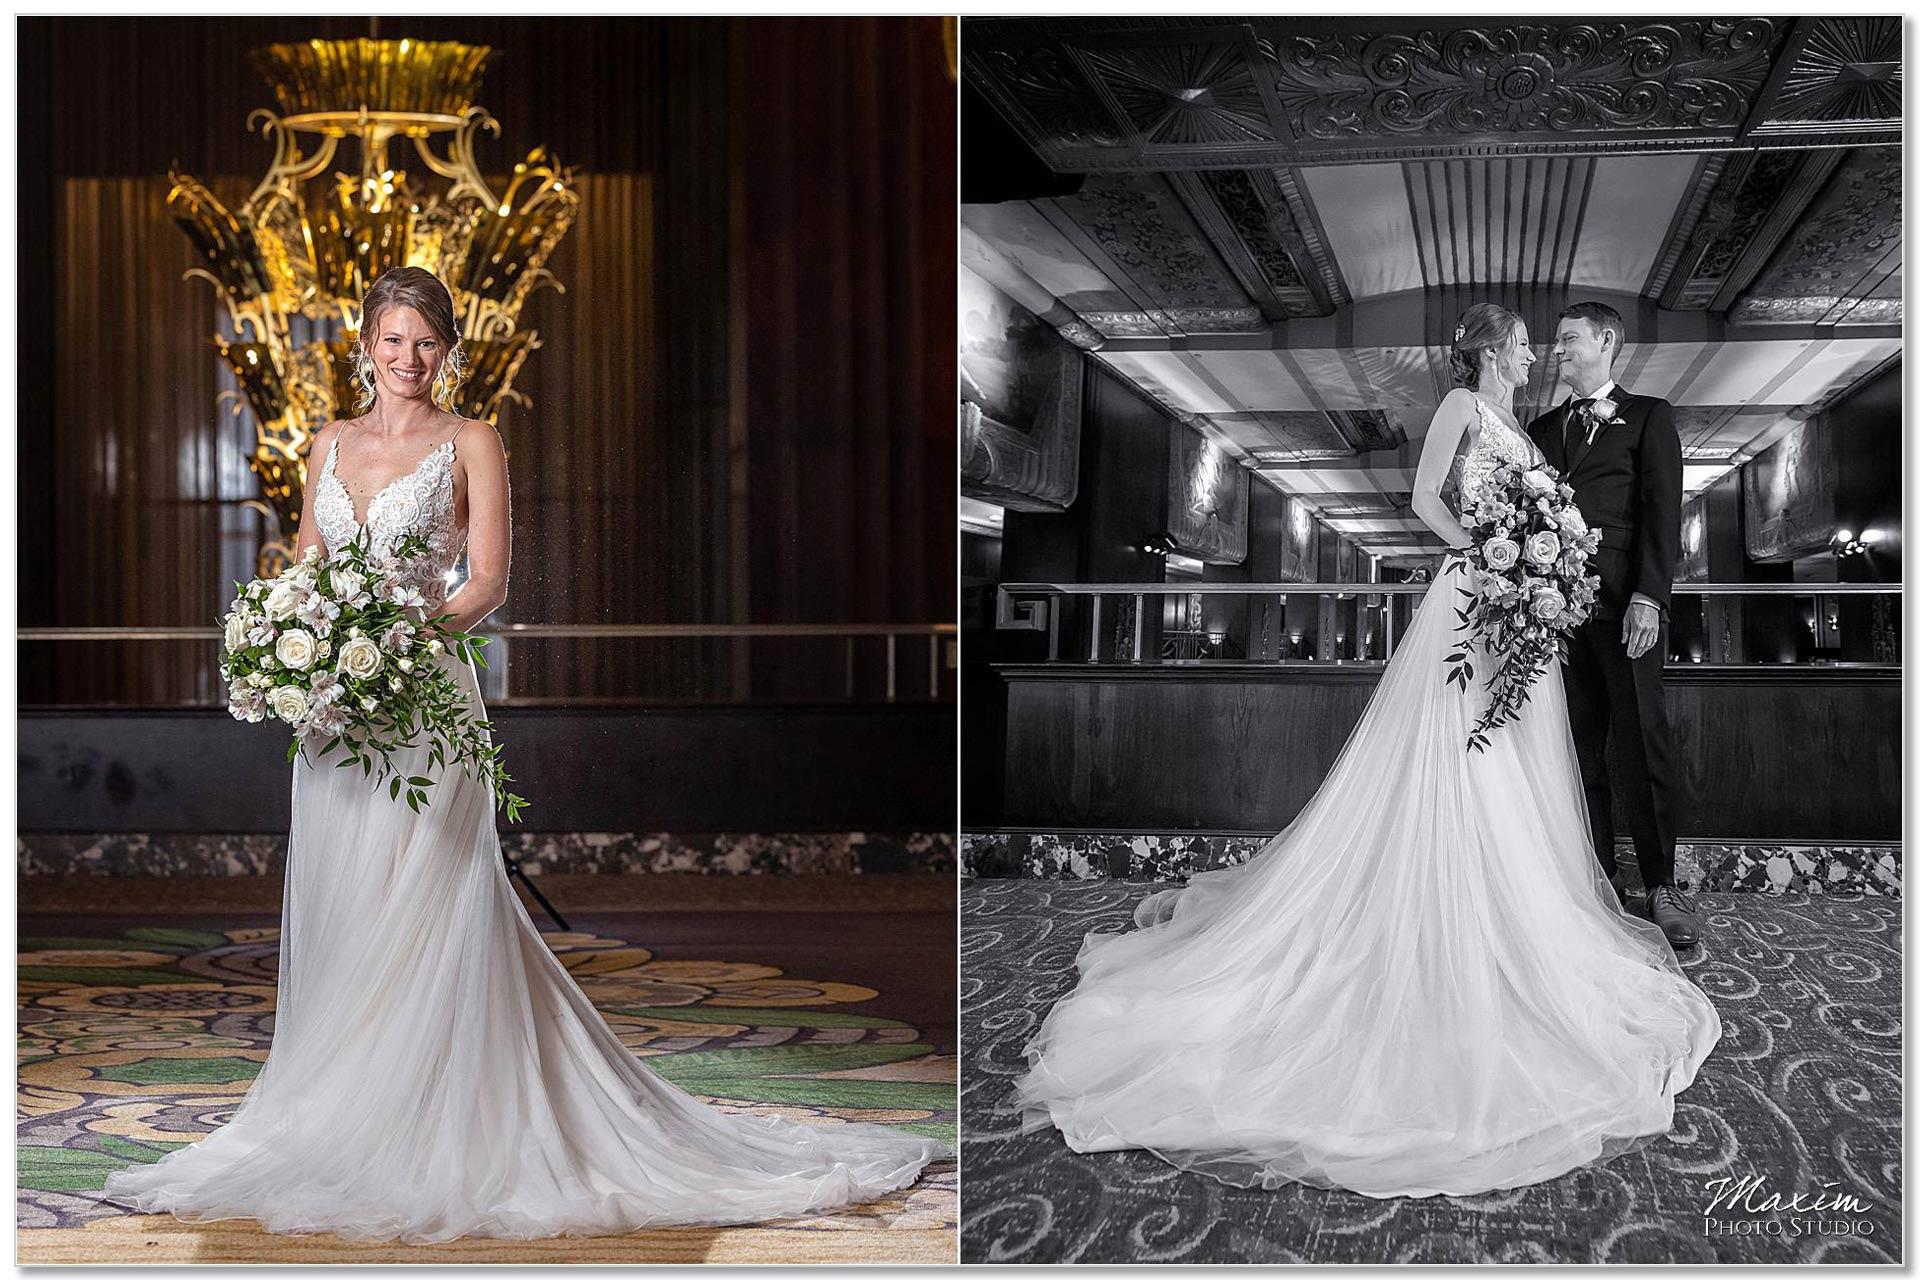 Hilton Netherland Plaza Hotel Bride Groom Portraits